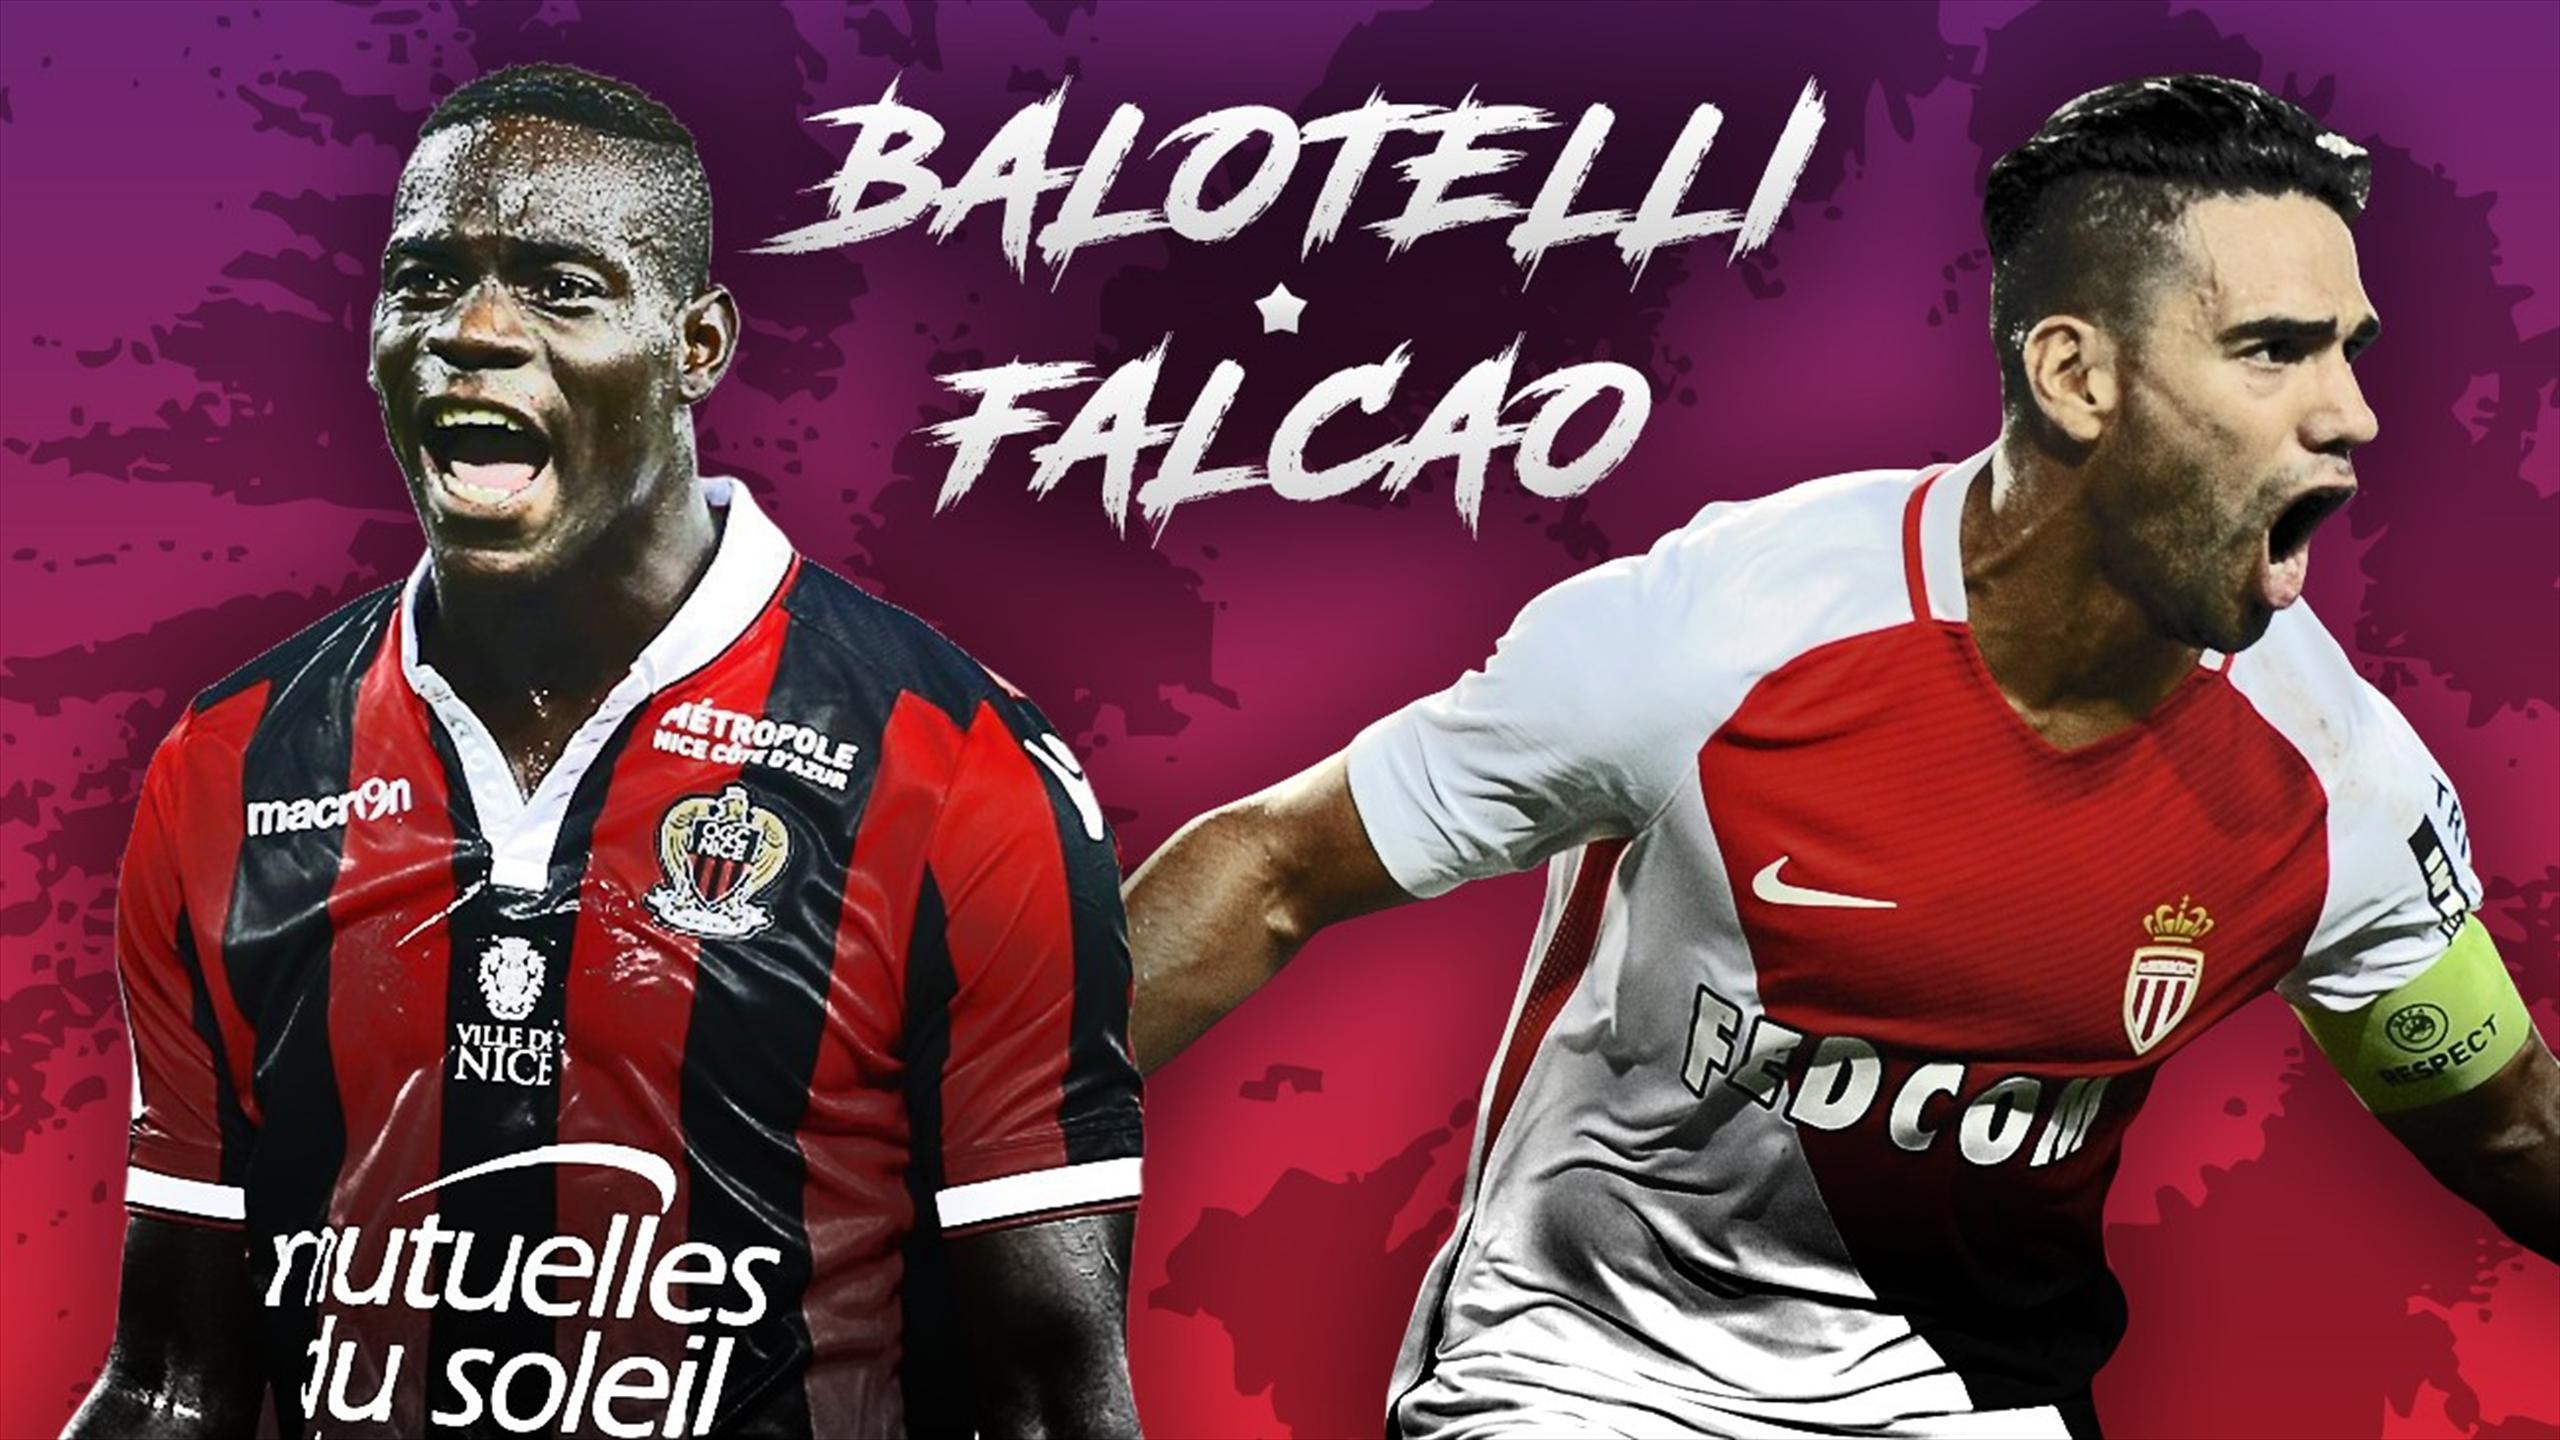 Balotelli et Falcao avant Nice-Monaco